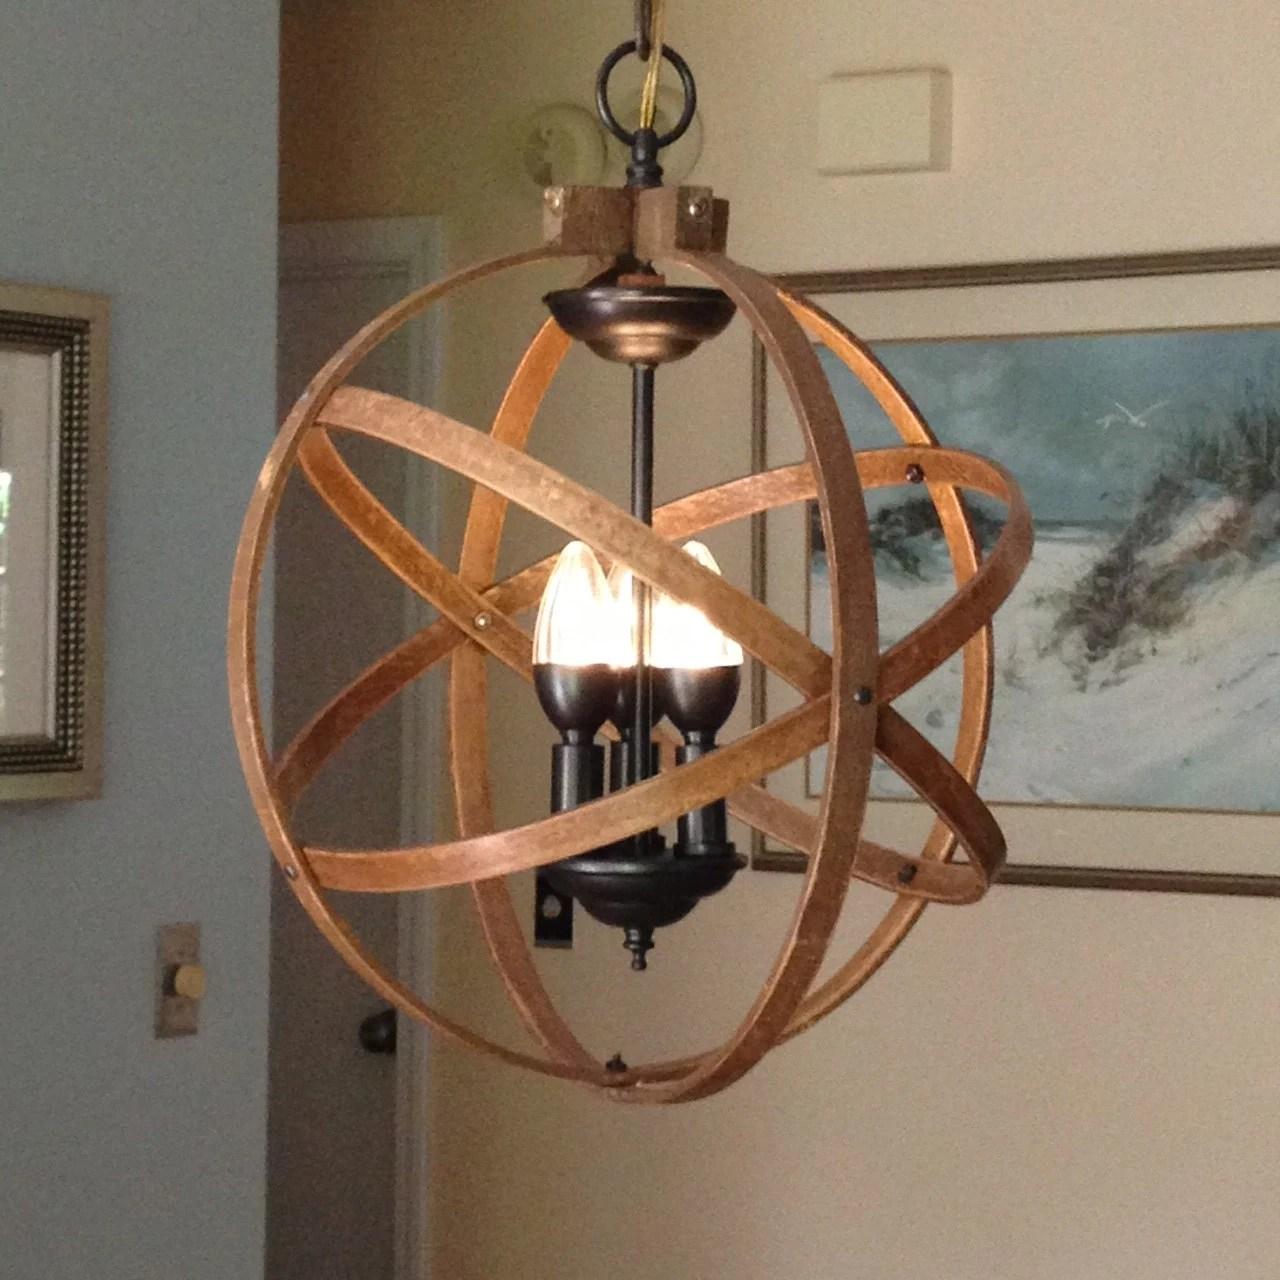 orb chandelier light 14 atomic light rustic pendant lighting kitchen Lighting Pendant Sphere Rustic Unique Hanging Dining zoom